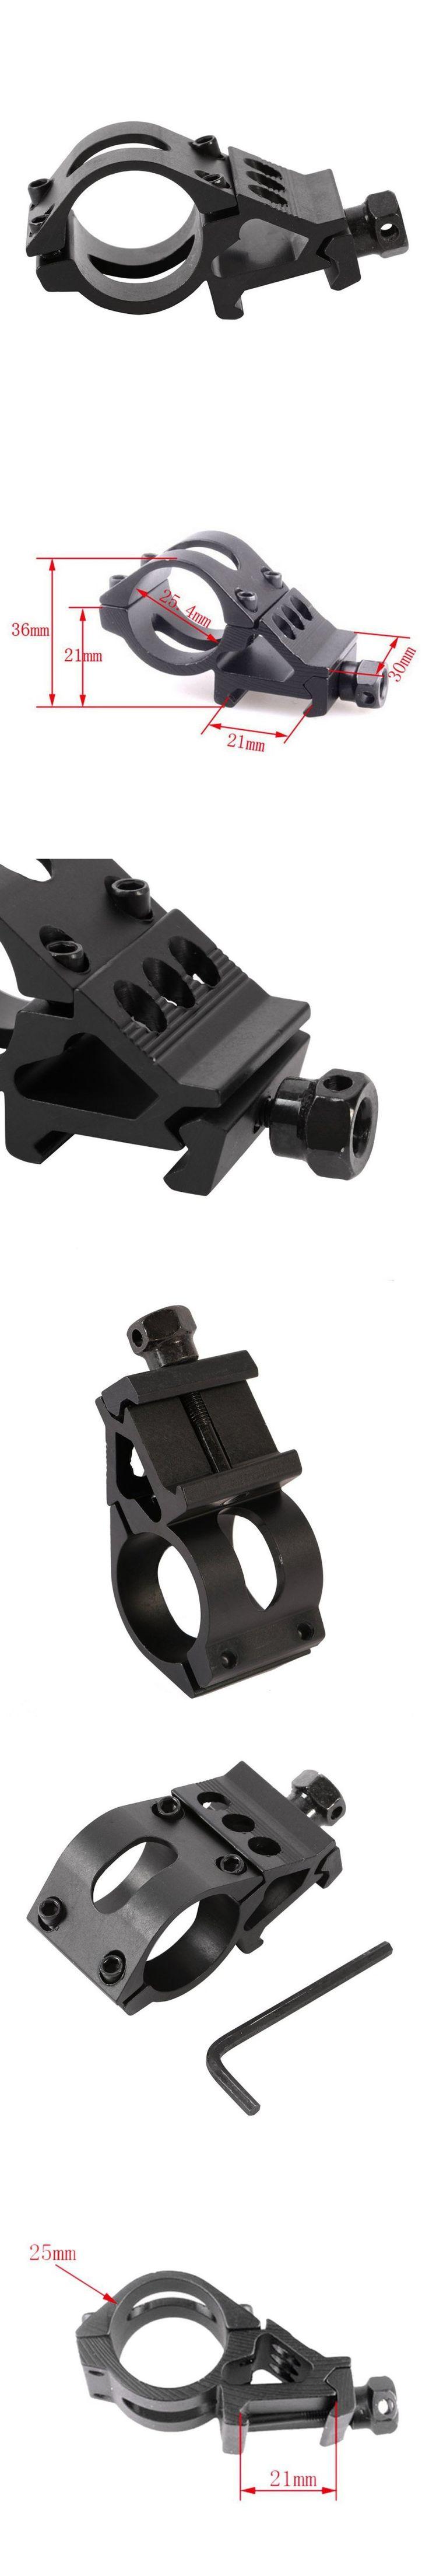 25mm Scope Mounts Flashlight Torch Laser Mounts + Allen Key Ring Tactical Scope Sight for 20mm Standard Picatinny/Weaver Rail